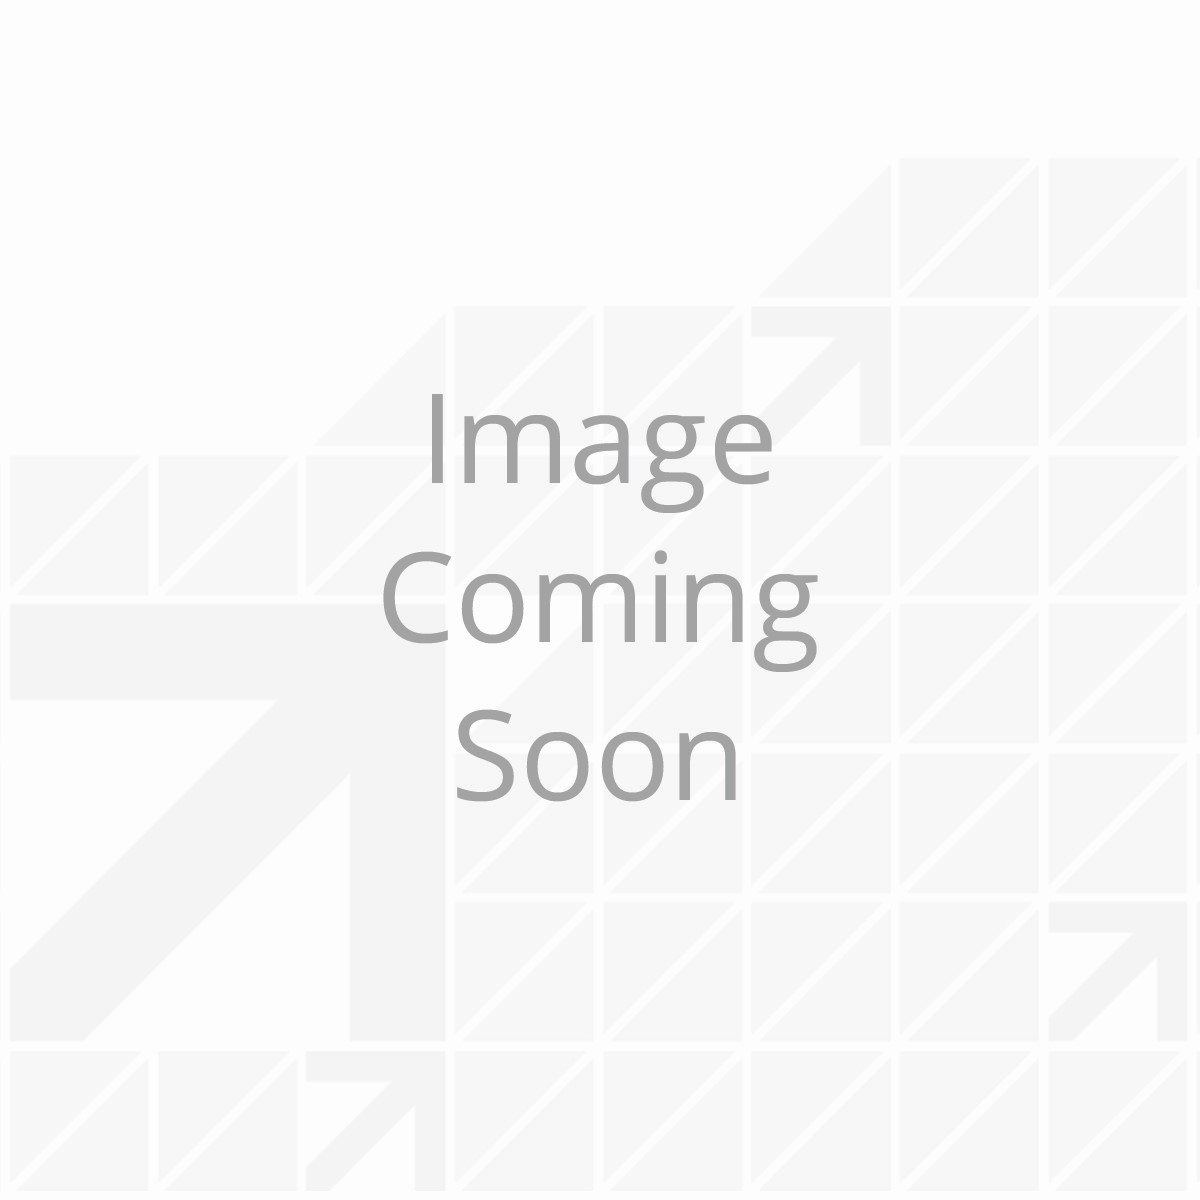 Lippert Components Zip-Up Jacket